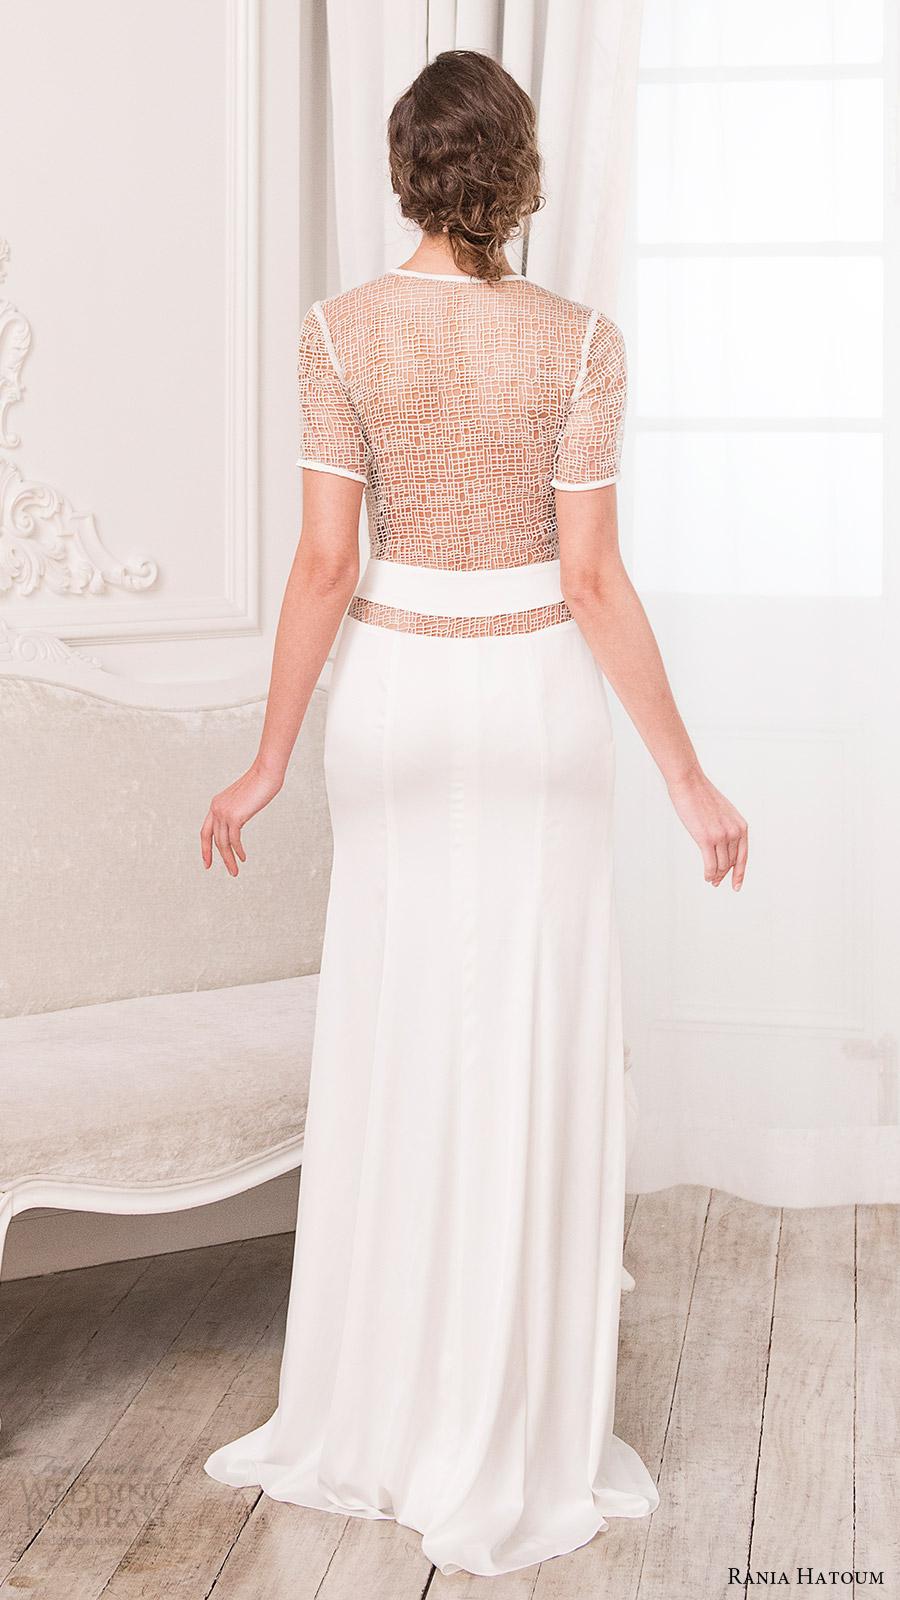 rania hatoum bridal spring 2017 short sleeves crew neck sheath wedding dress (mandy) bv